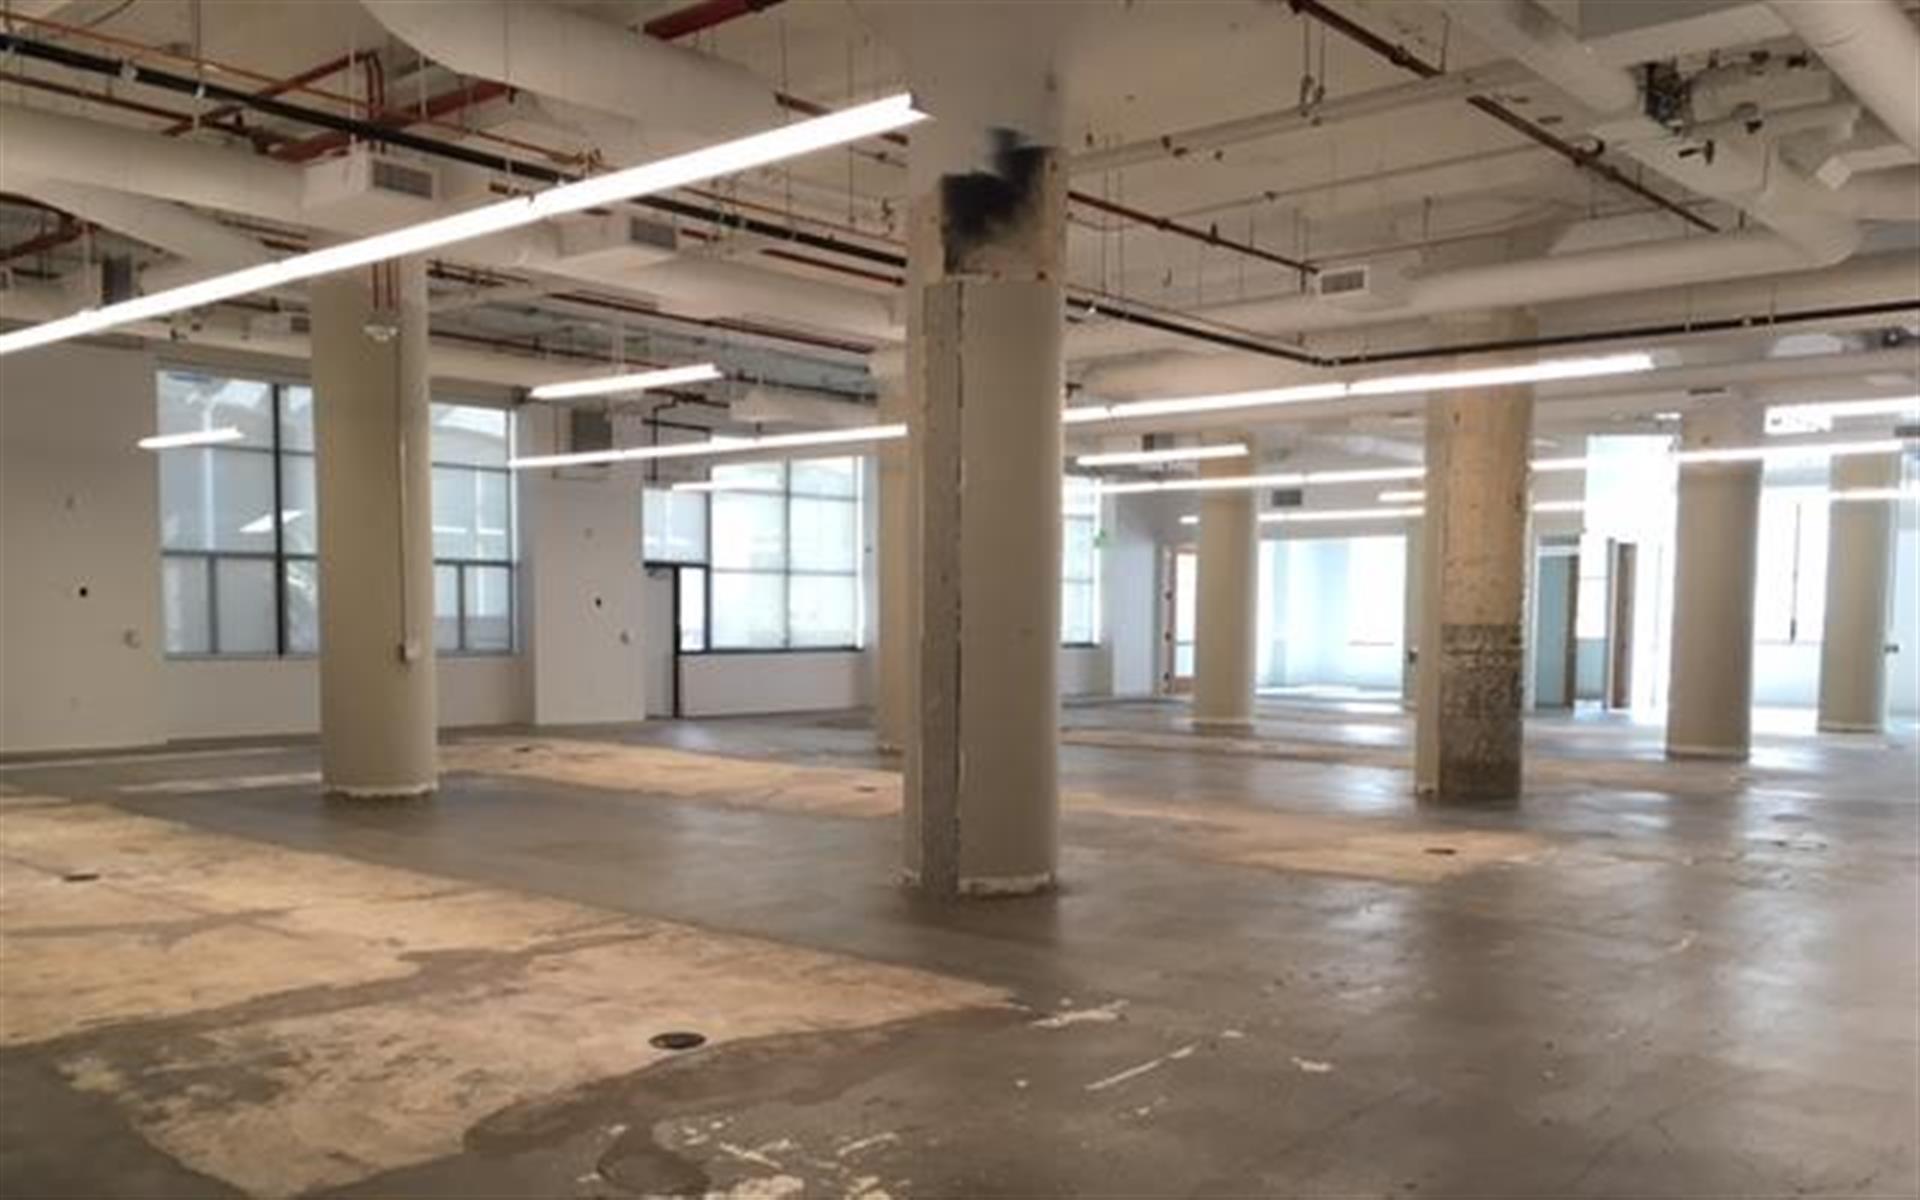 Swig Co | 501 Second Street - altSpace Team Office - Suite 120